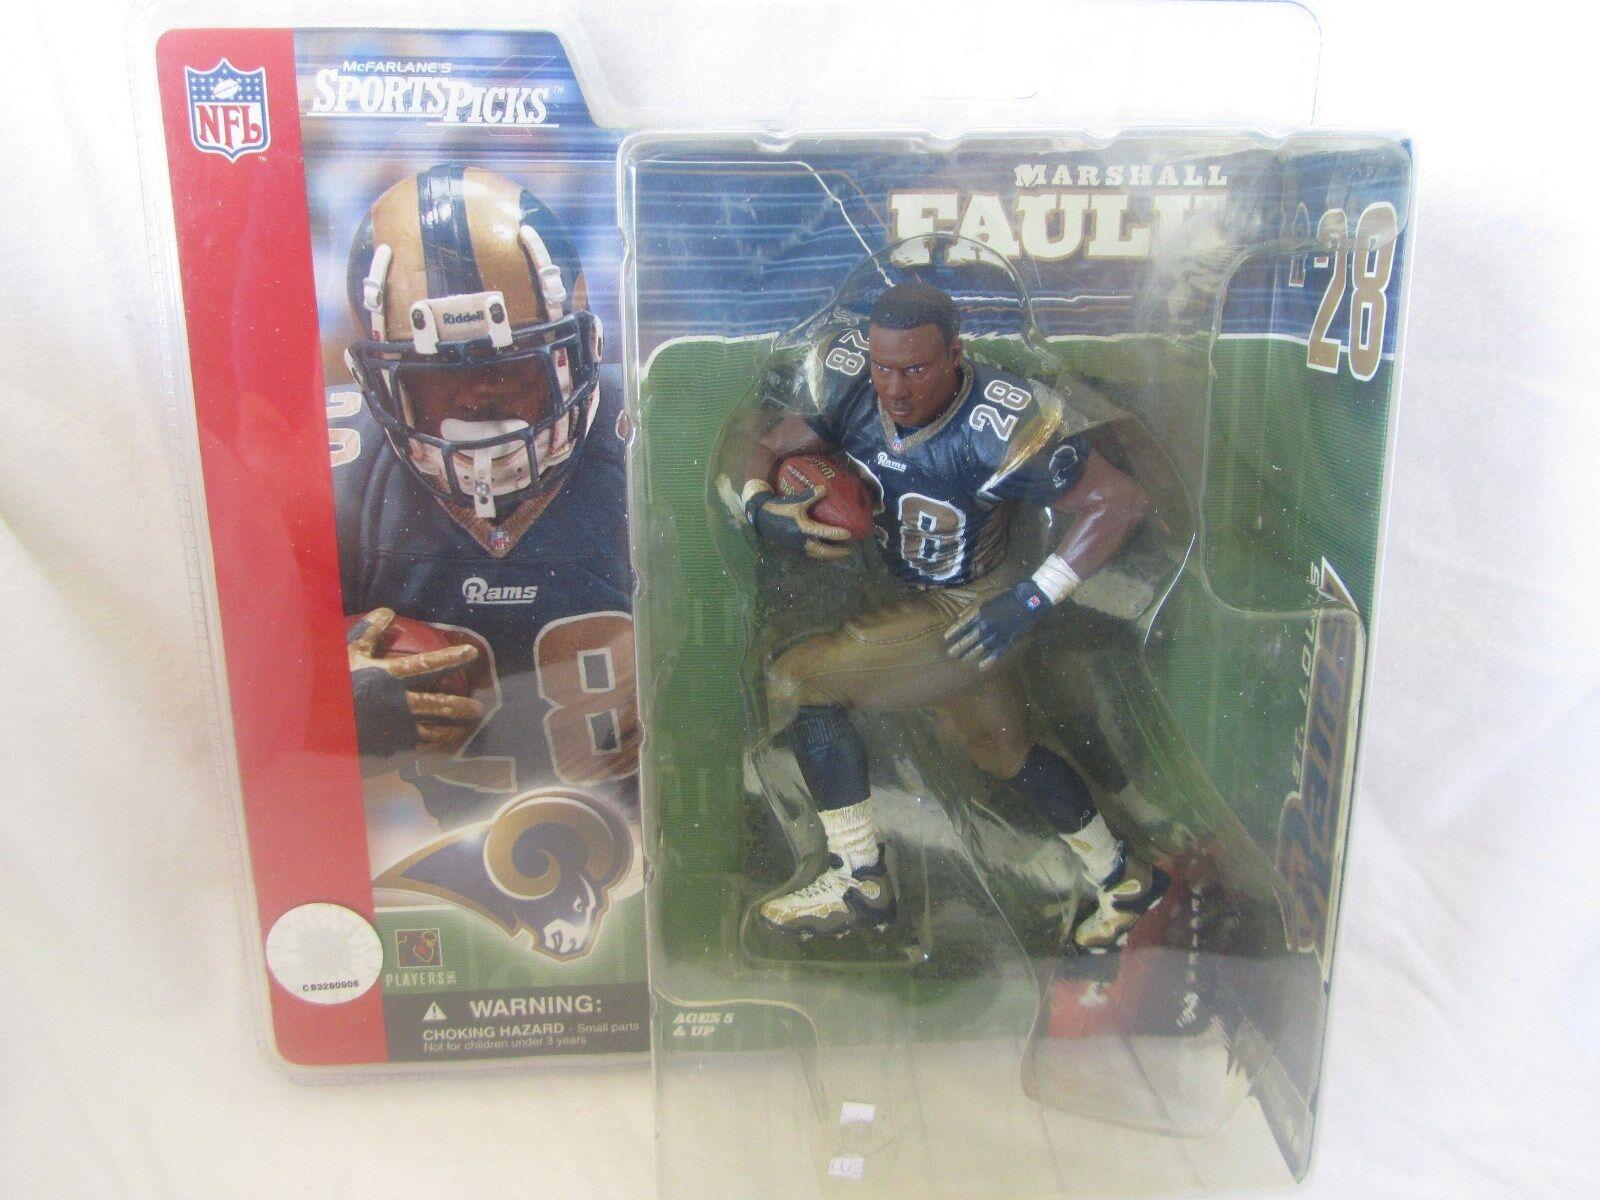 McFarlane NFL Series 2 Marshall Faulk Super Chase Variant - NO HELMET (RARE)